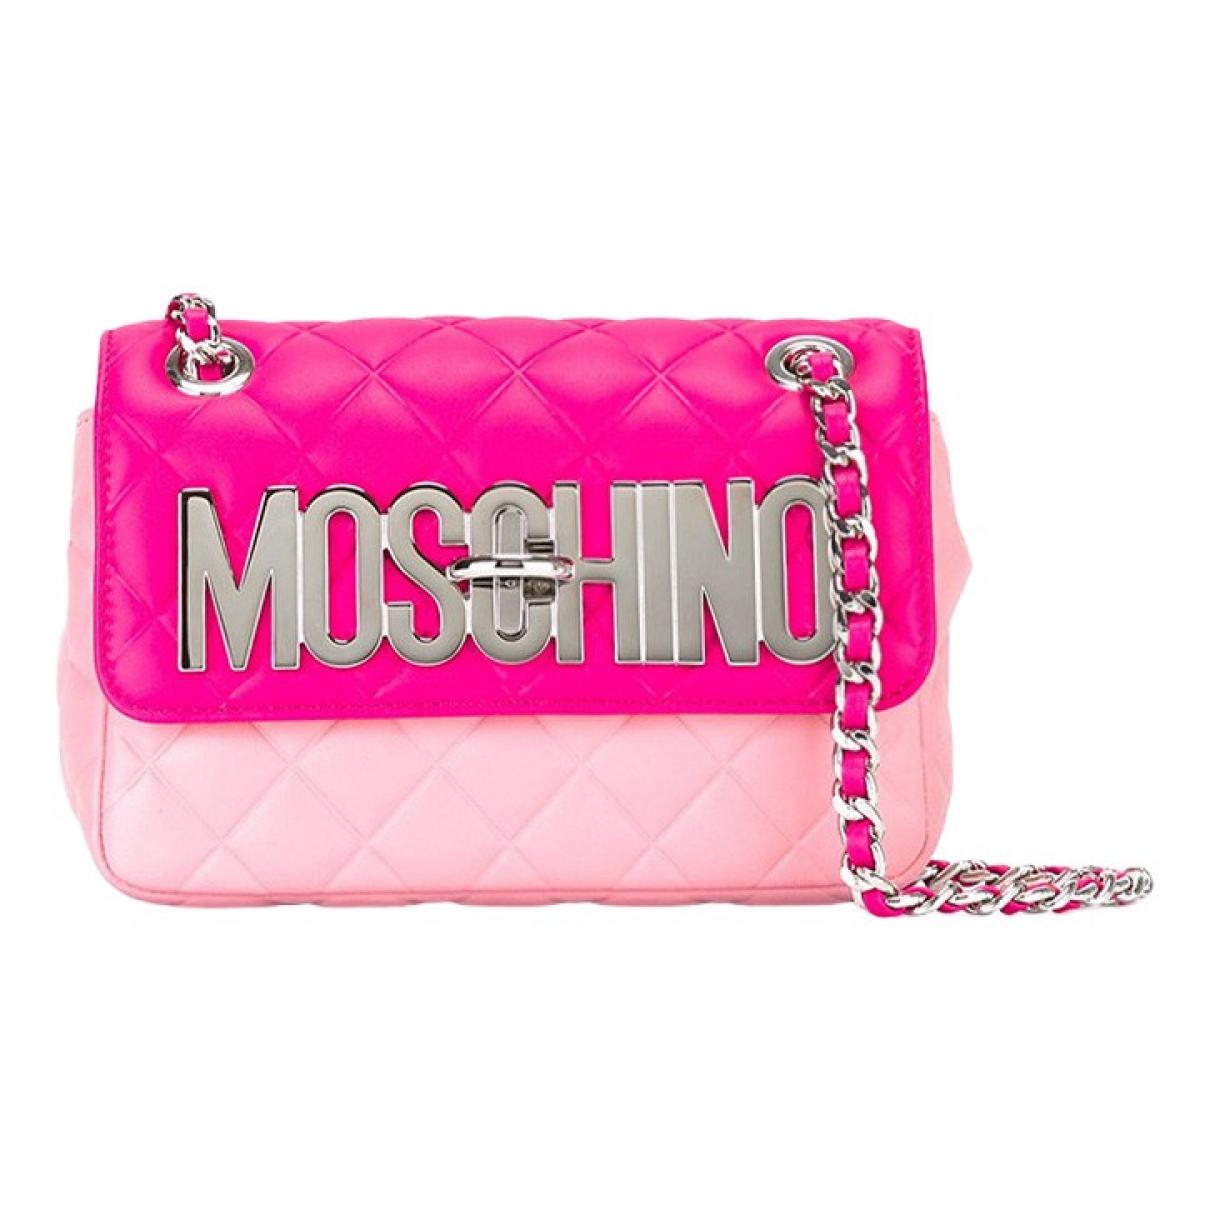 Moschino - Sac a main   pour femme en toile - rose